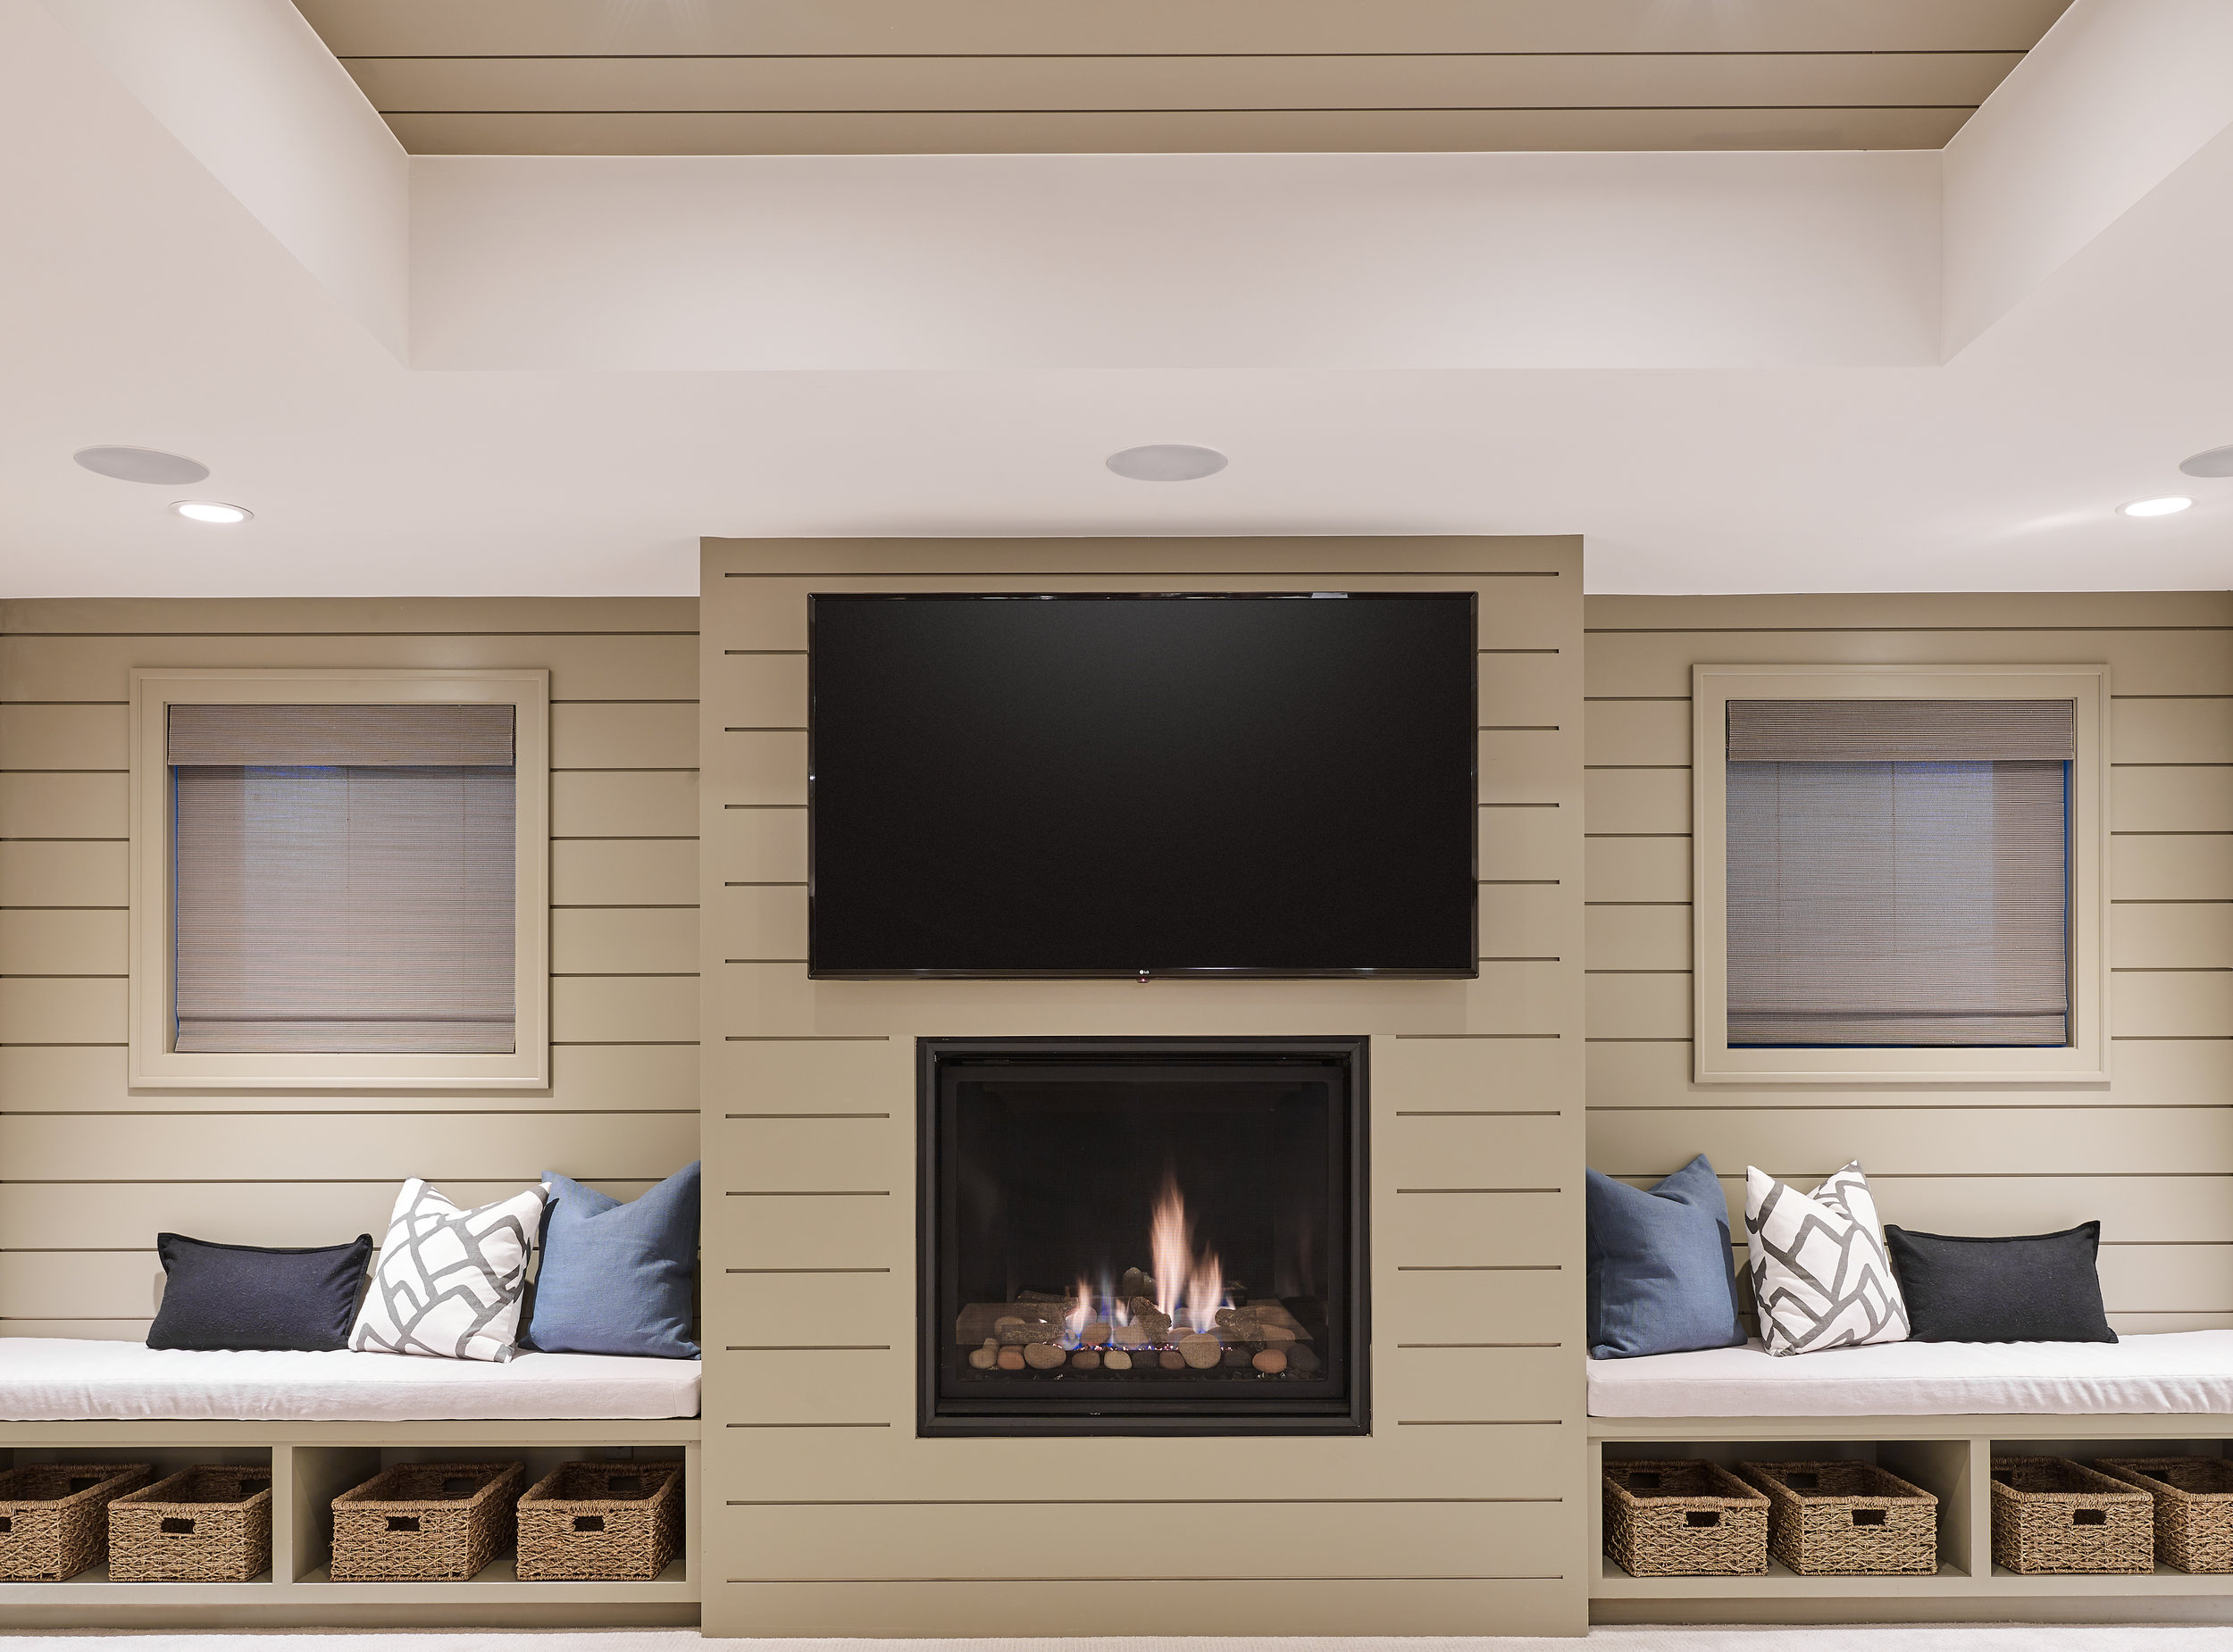 WEB_pam_442_s_vine_basement_fireplace_85380.jpg